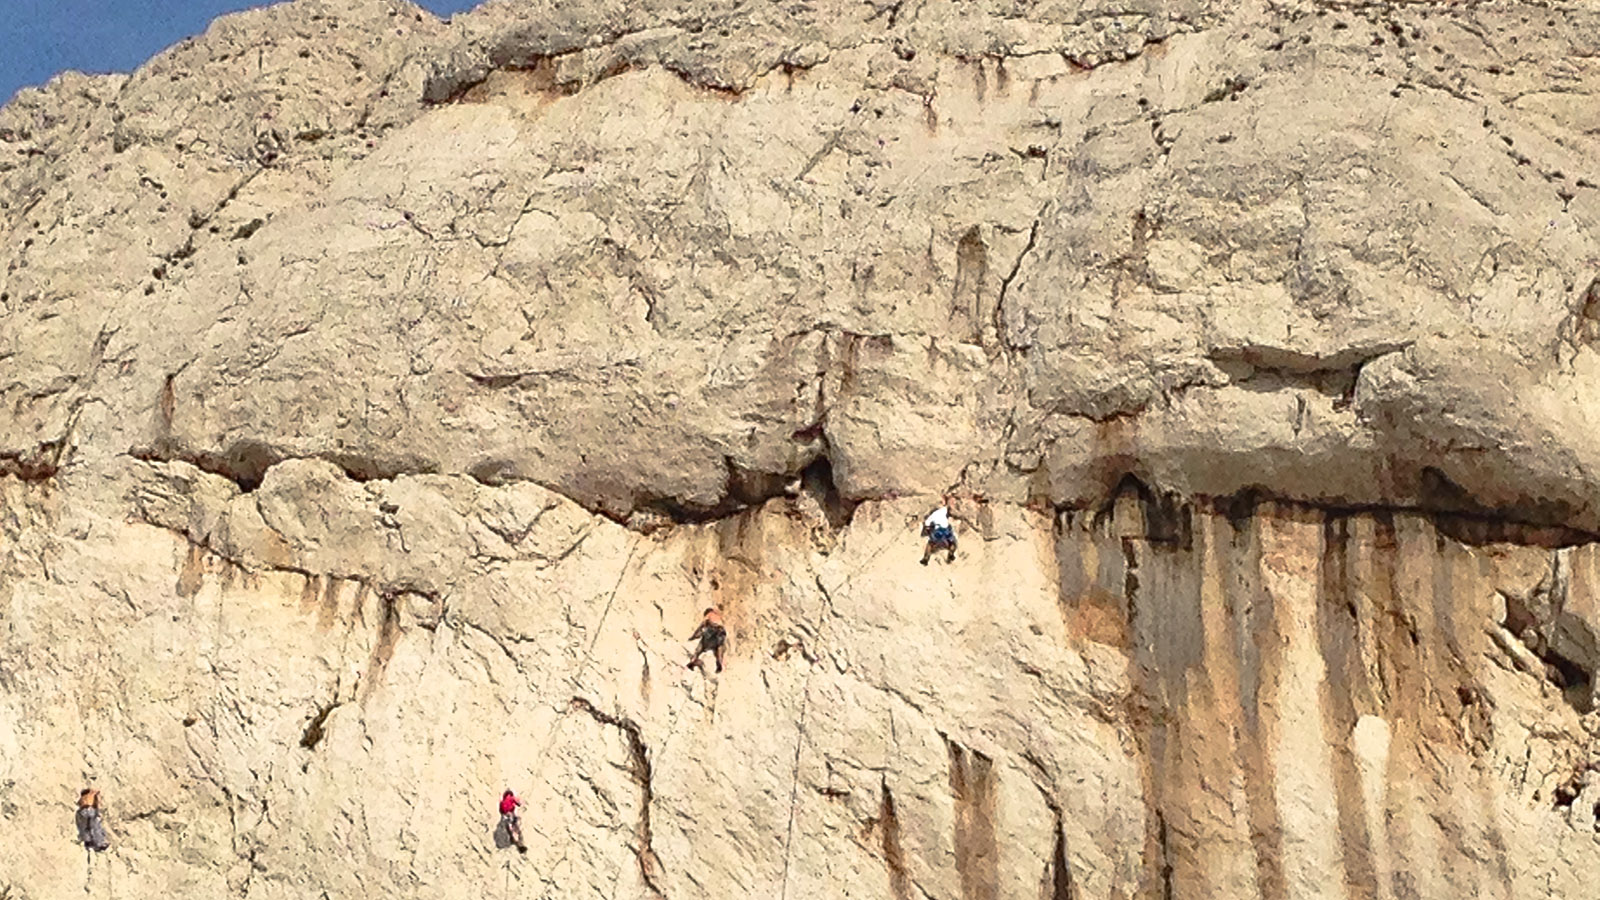 Calanques de Marseile: Kletterer in den Klippen von Sormiou. Foto: Hilke Maunder